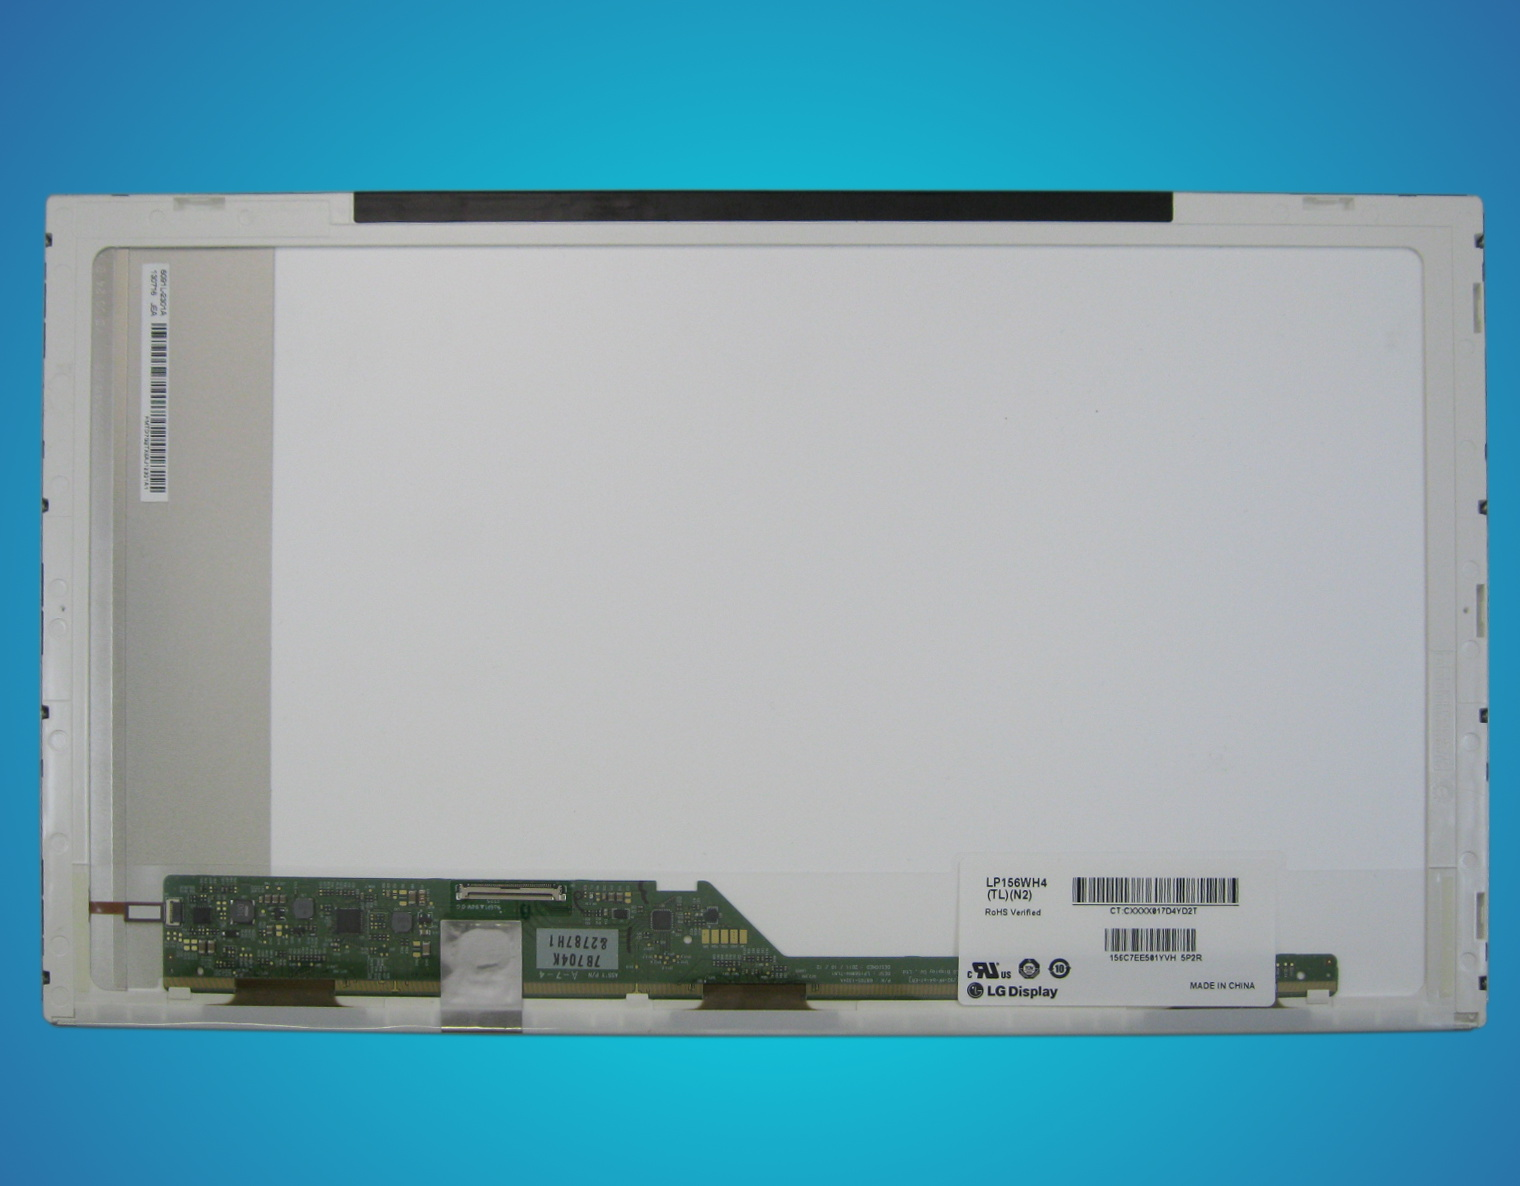 15.6 Laptop LED Screen LCD Display 1366*768 For Acer Aspire 5536 5738 5738Z 5740 5741 5741G 5742 5742G 5750 5750G